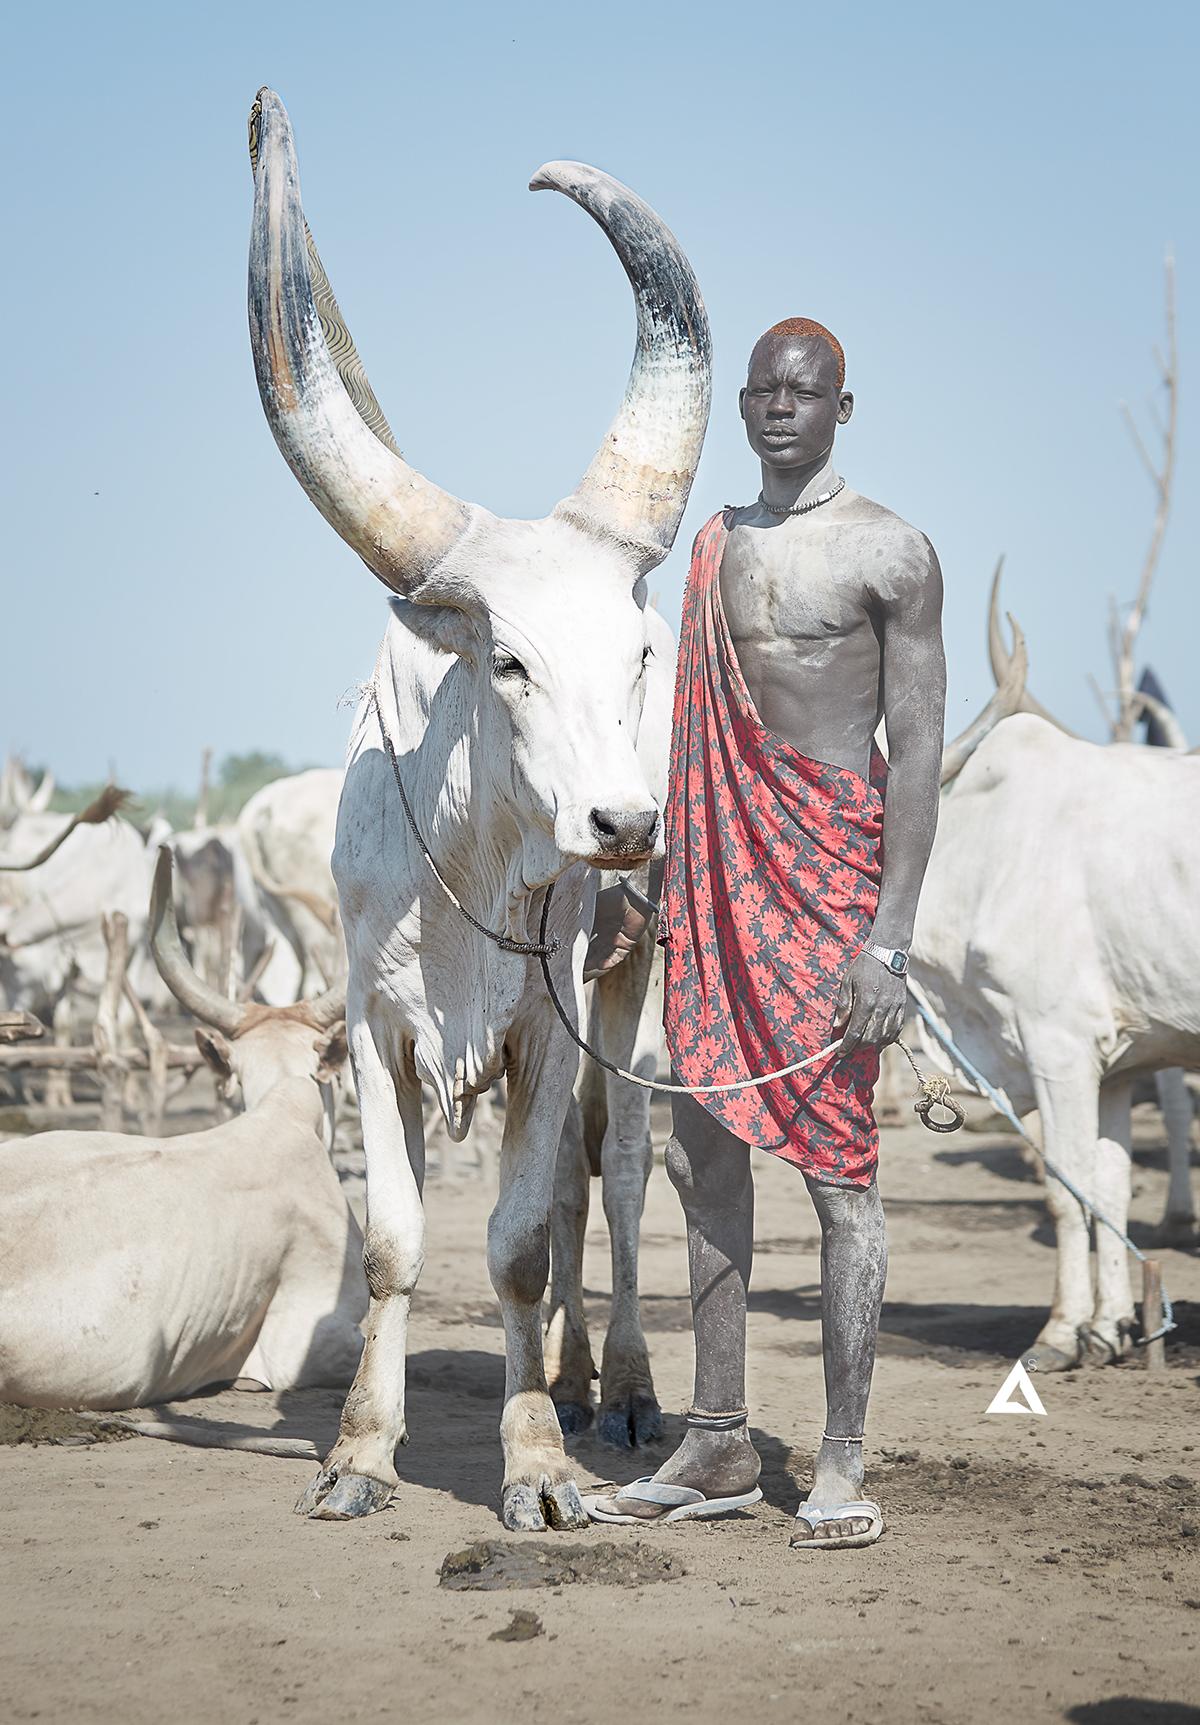 portrait tribe tribal africa culture South Sudan